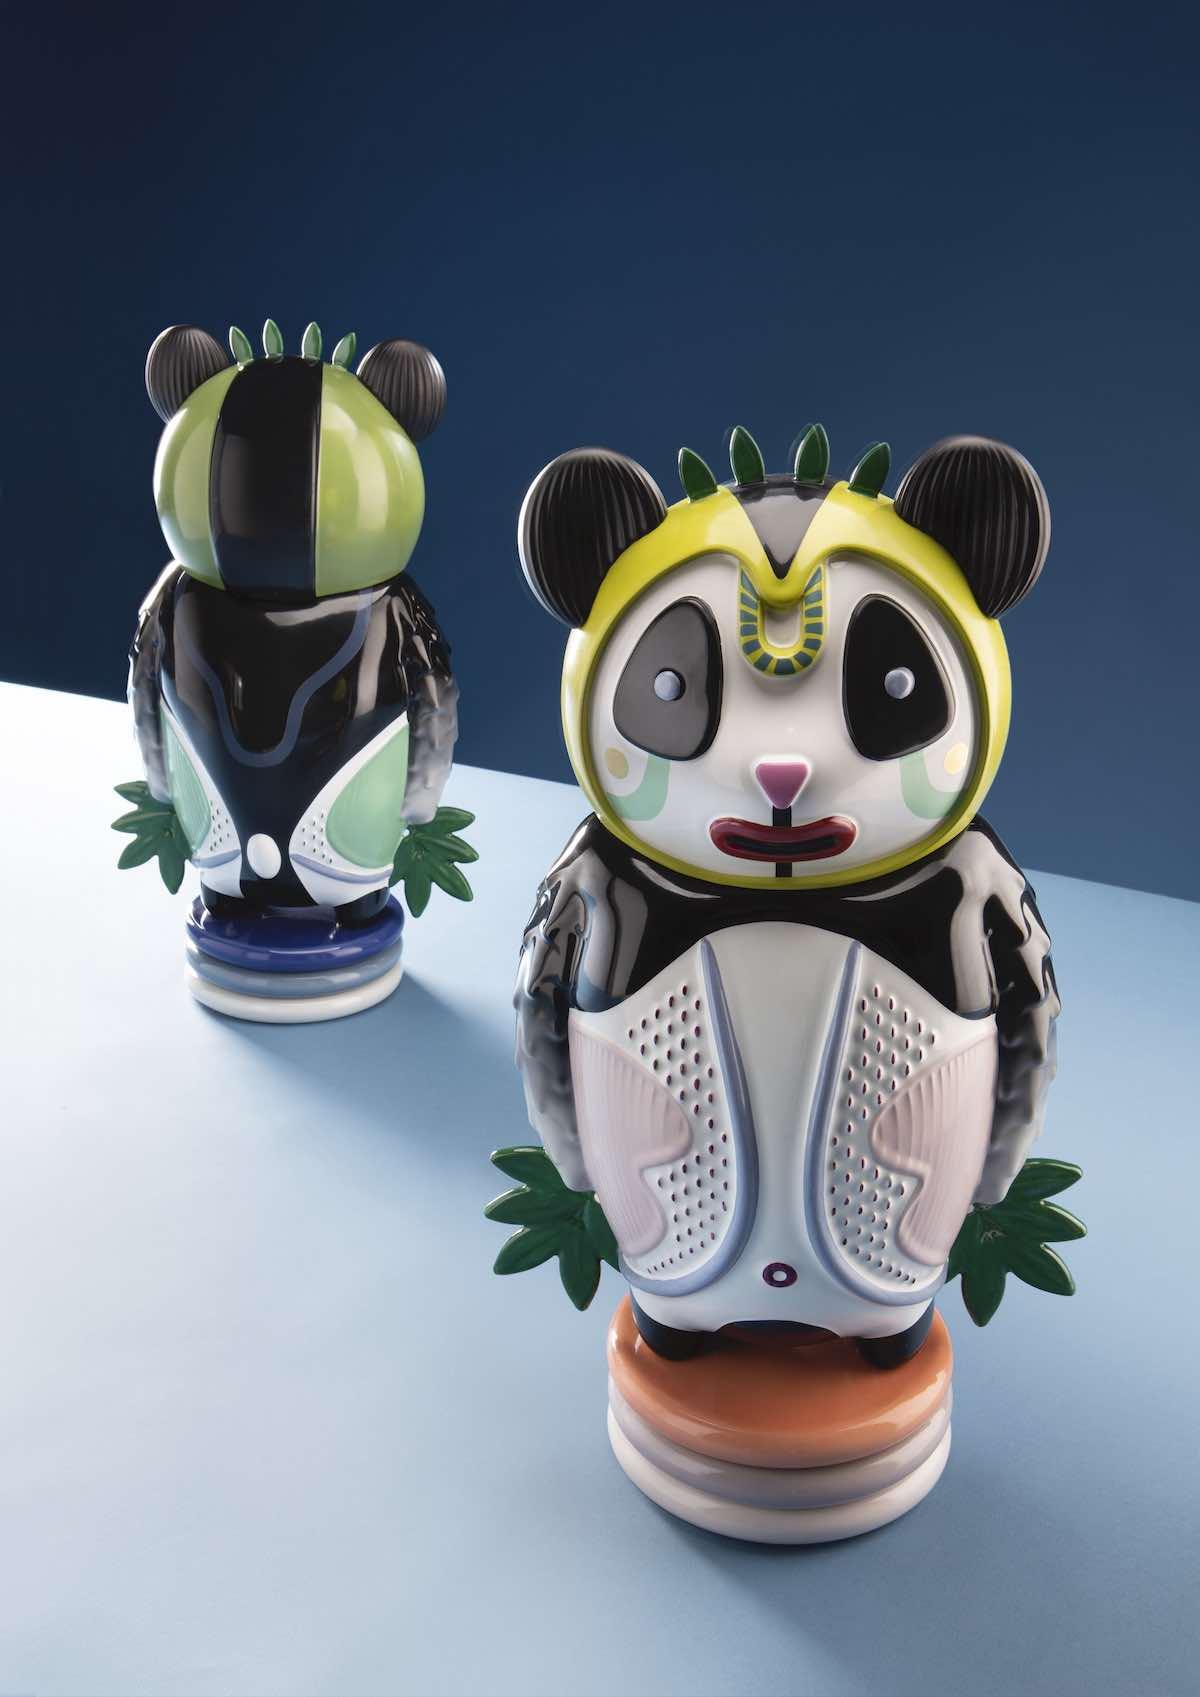 Bernardo panda bear sculpture by Elena Salmistraro x Bosa Ceramiche - Courtesy of Elena Salmistraro.